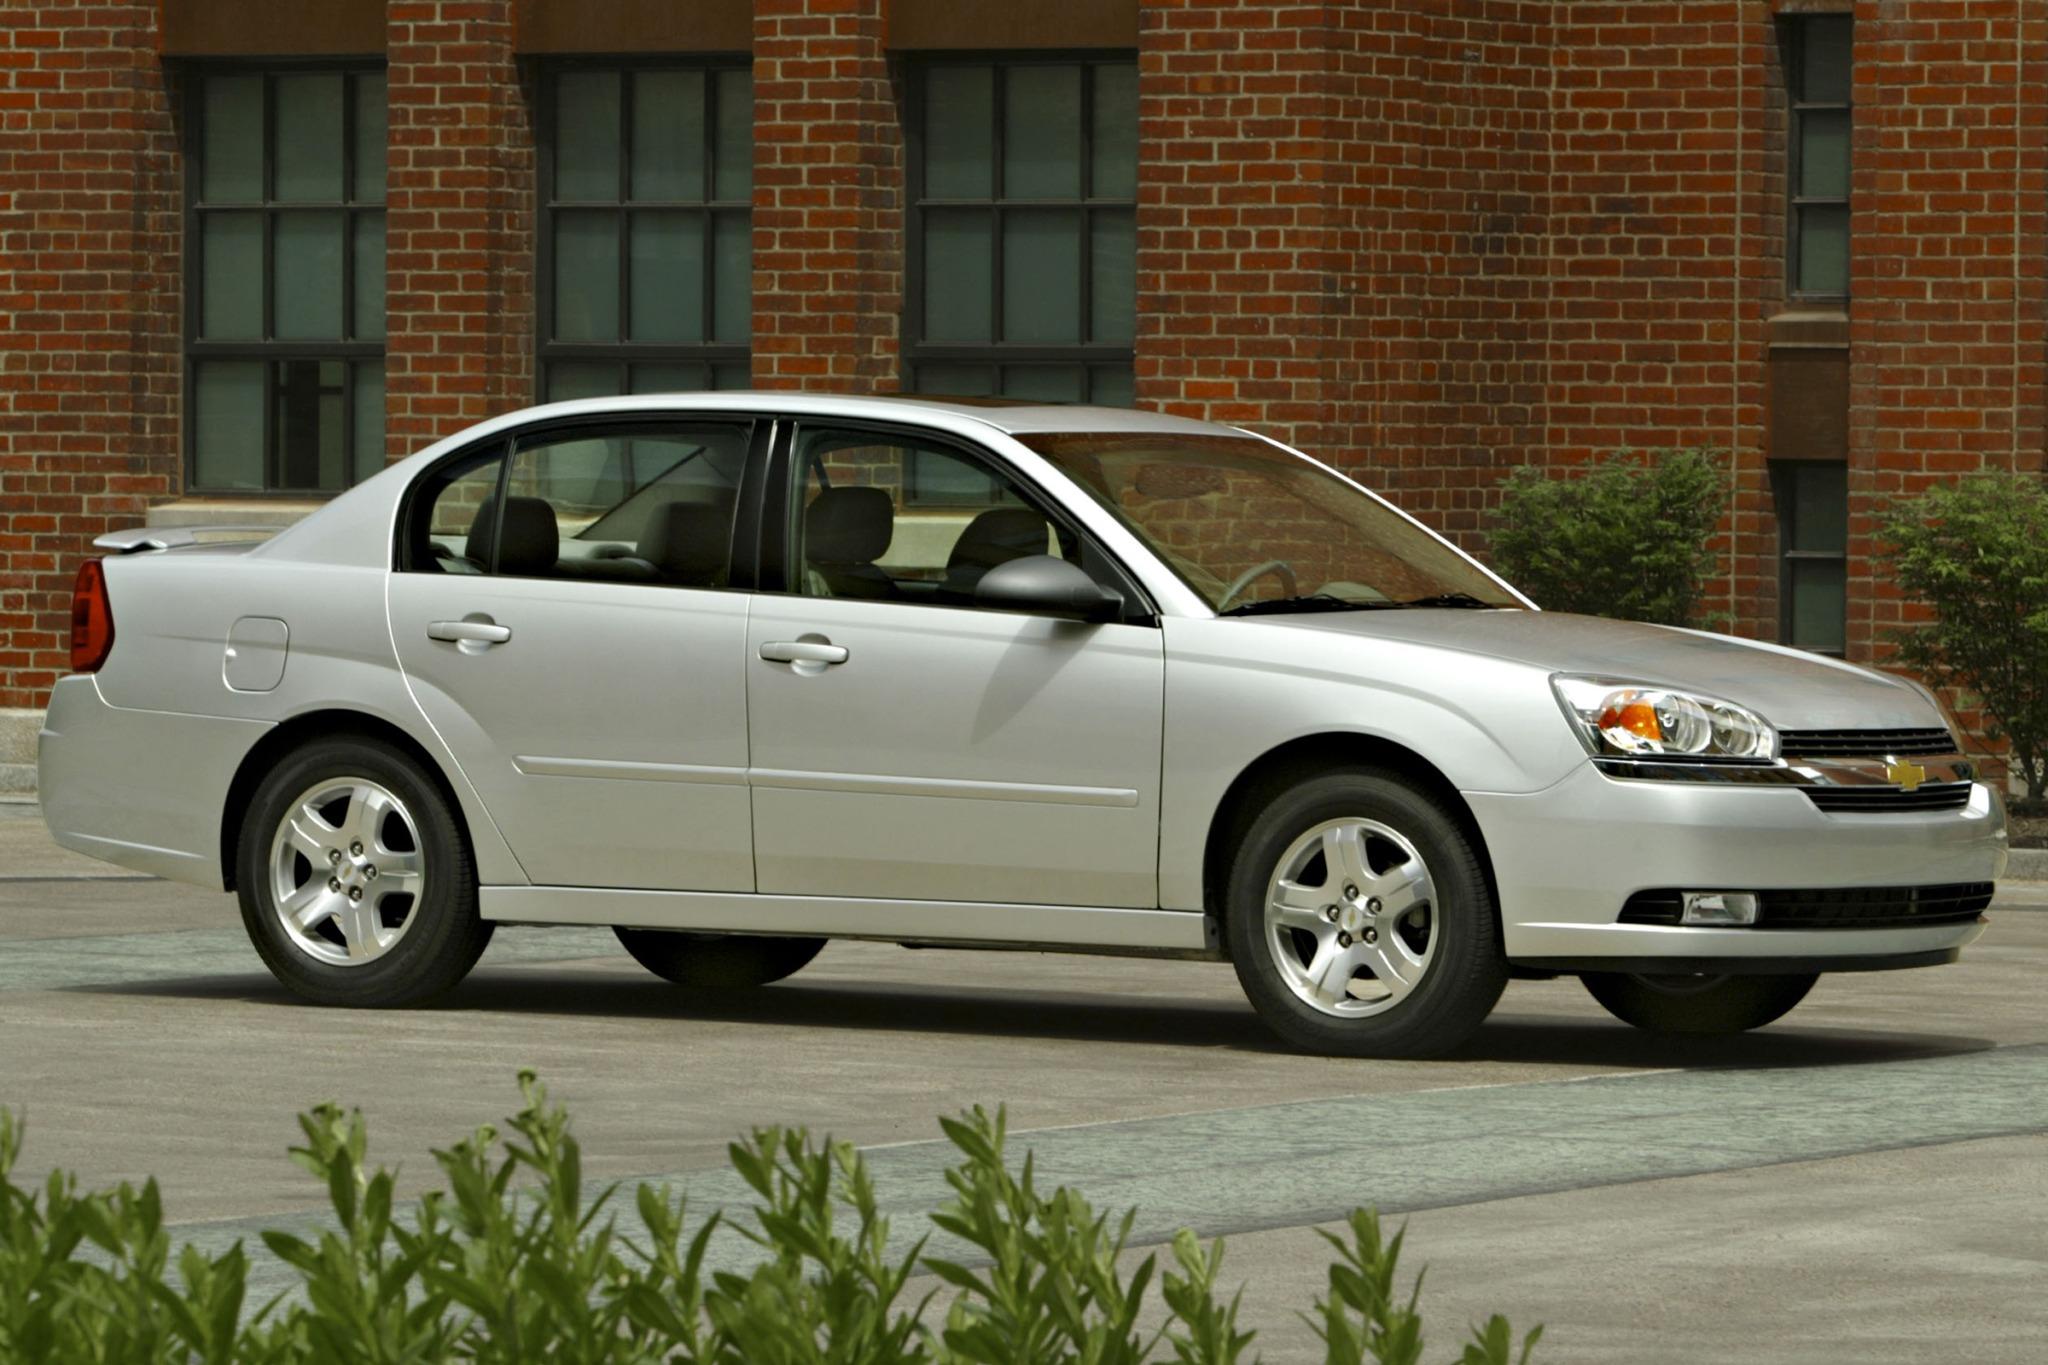 2007 Chevrolet Malibu Ls Vin Number Search